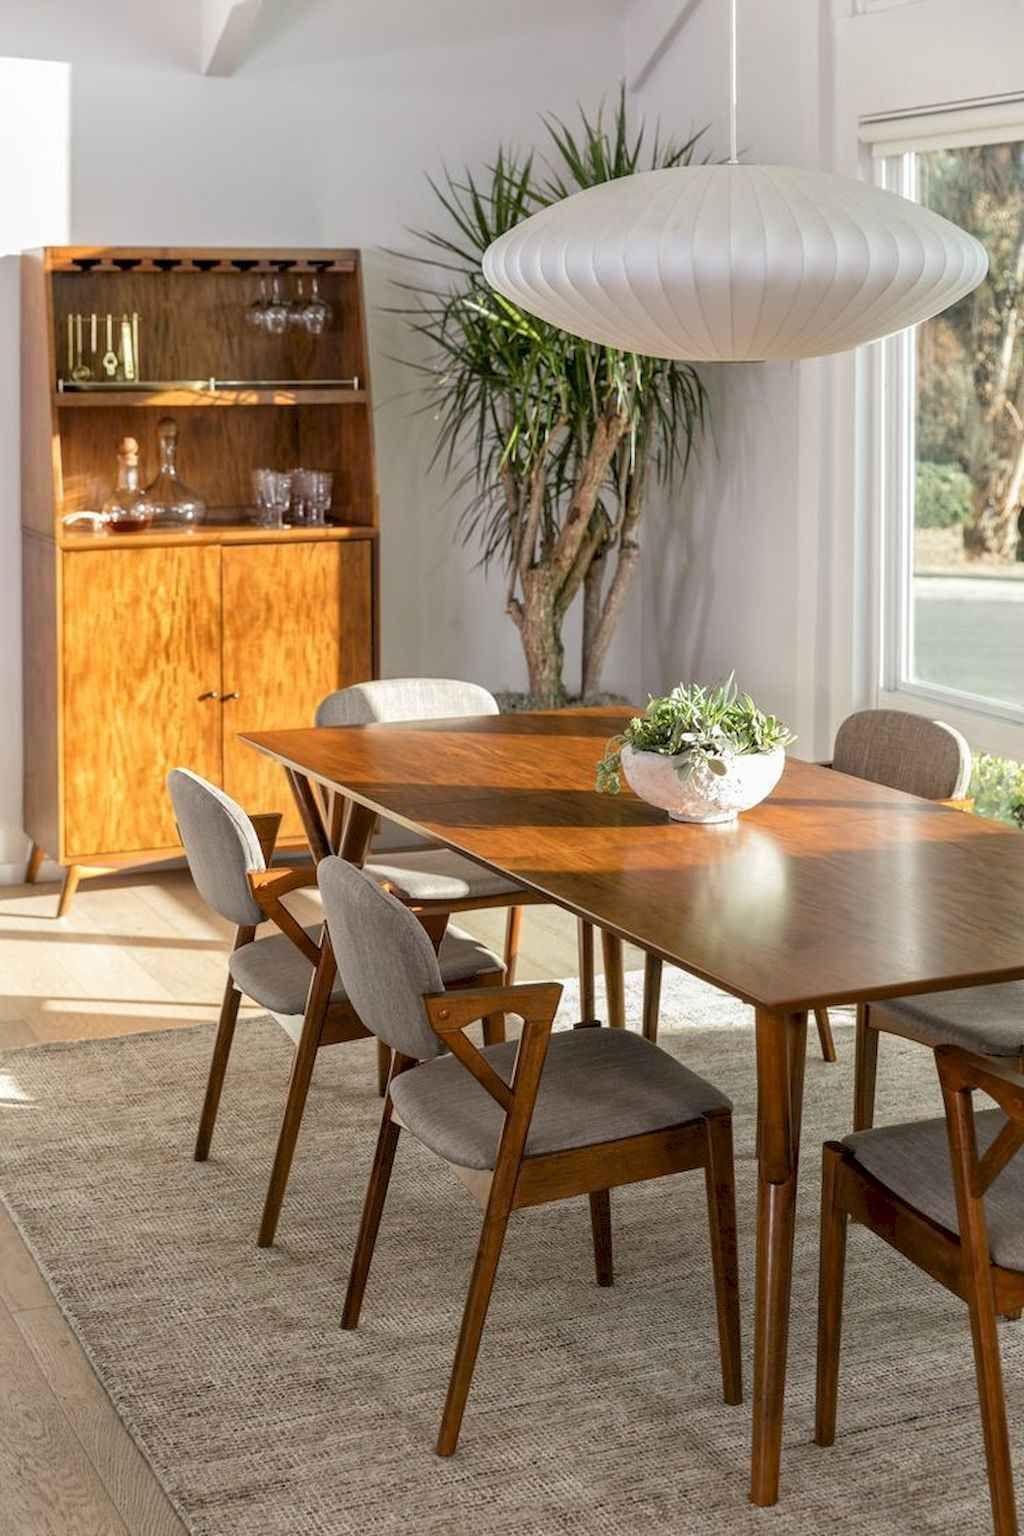 10 Inspirational Dining Room Ideas On Insplosion Blog Mid